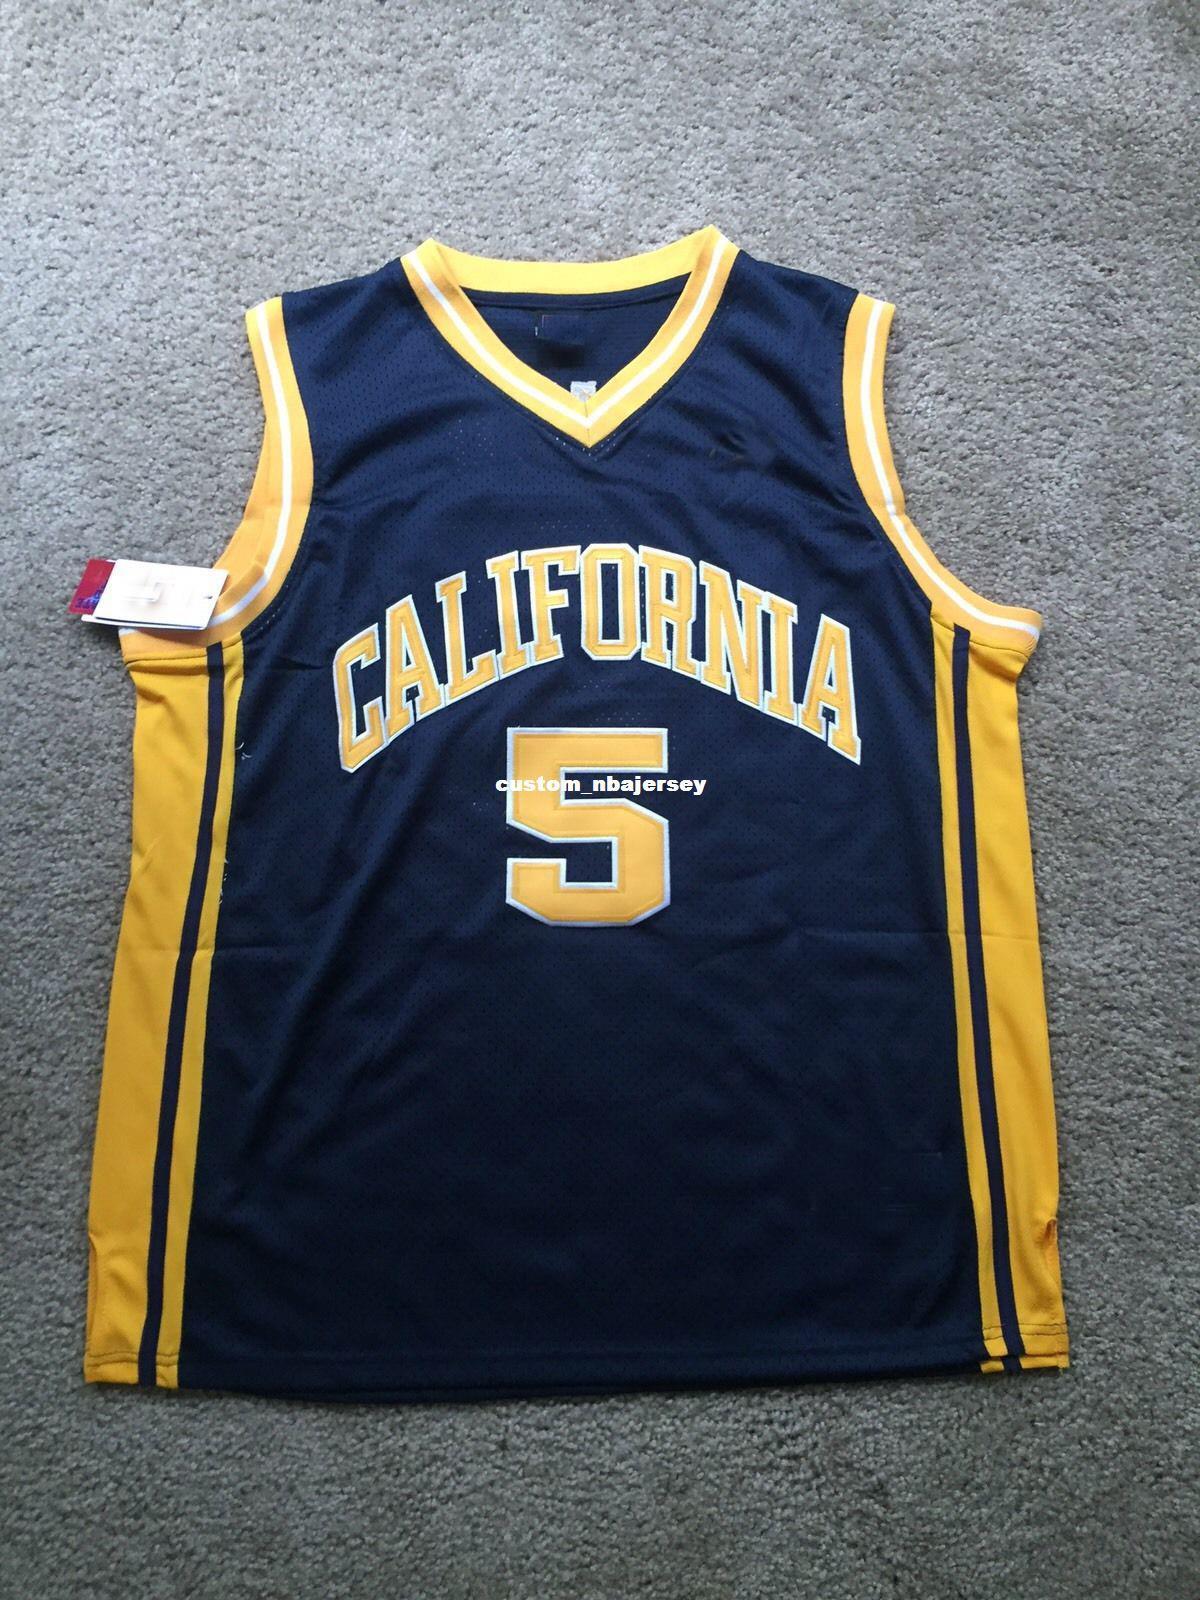 5c05e31d9e3 2019 Cheap Custom Vintage Jason Kidd California Golden Bears NCAA  Basketball Jersey Stitch Customize Any Number Name MEN WOMEN YOUTH XS 5XL  From ...